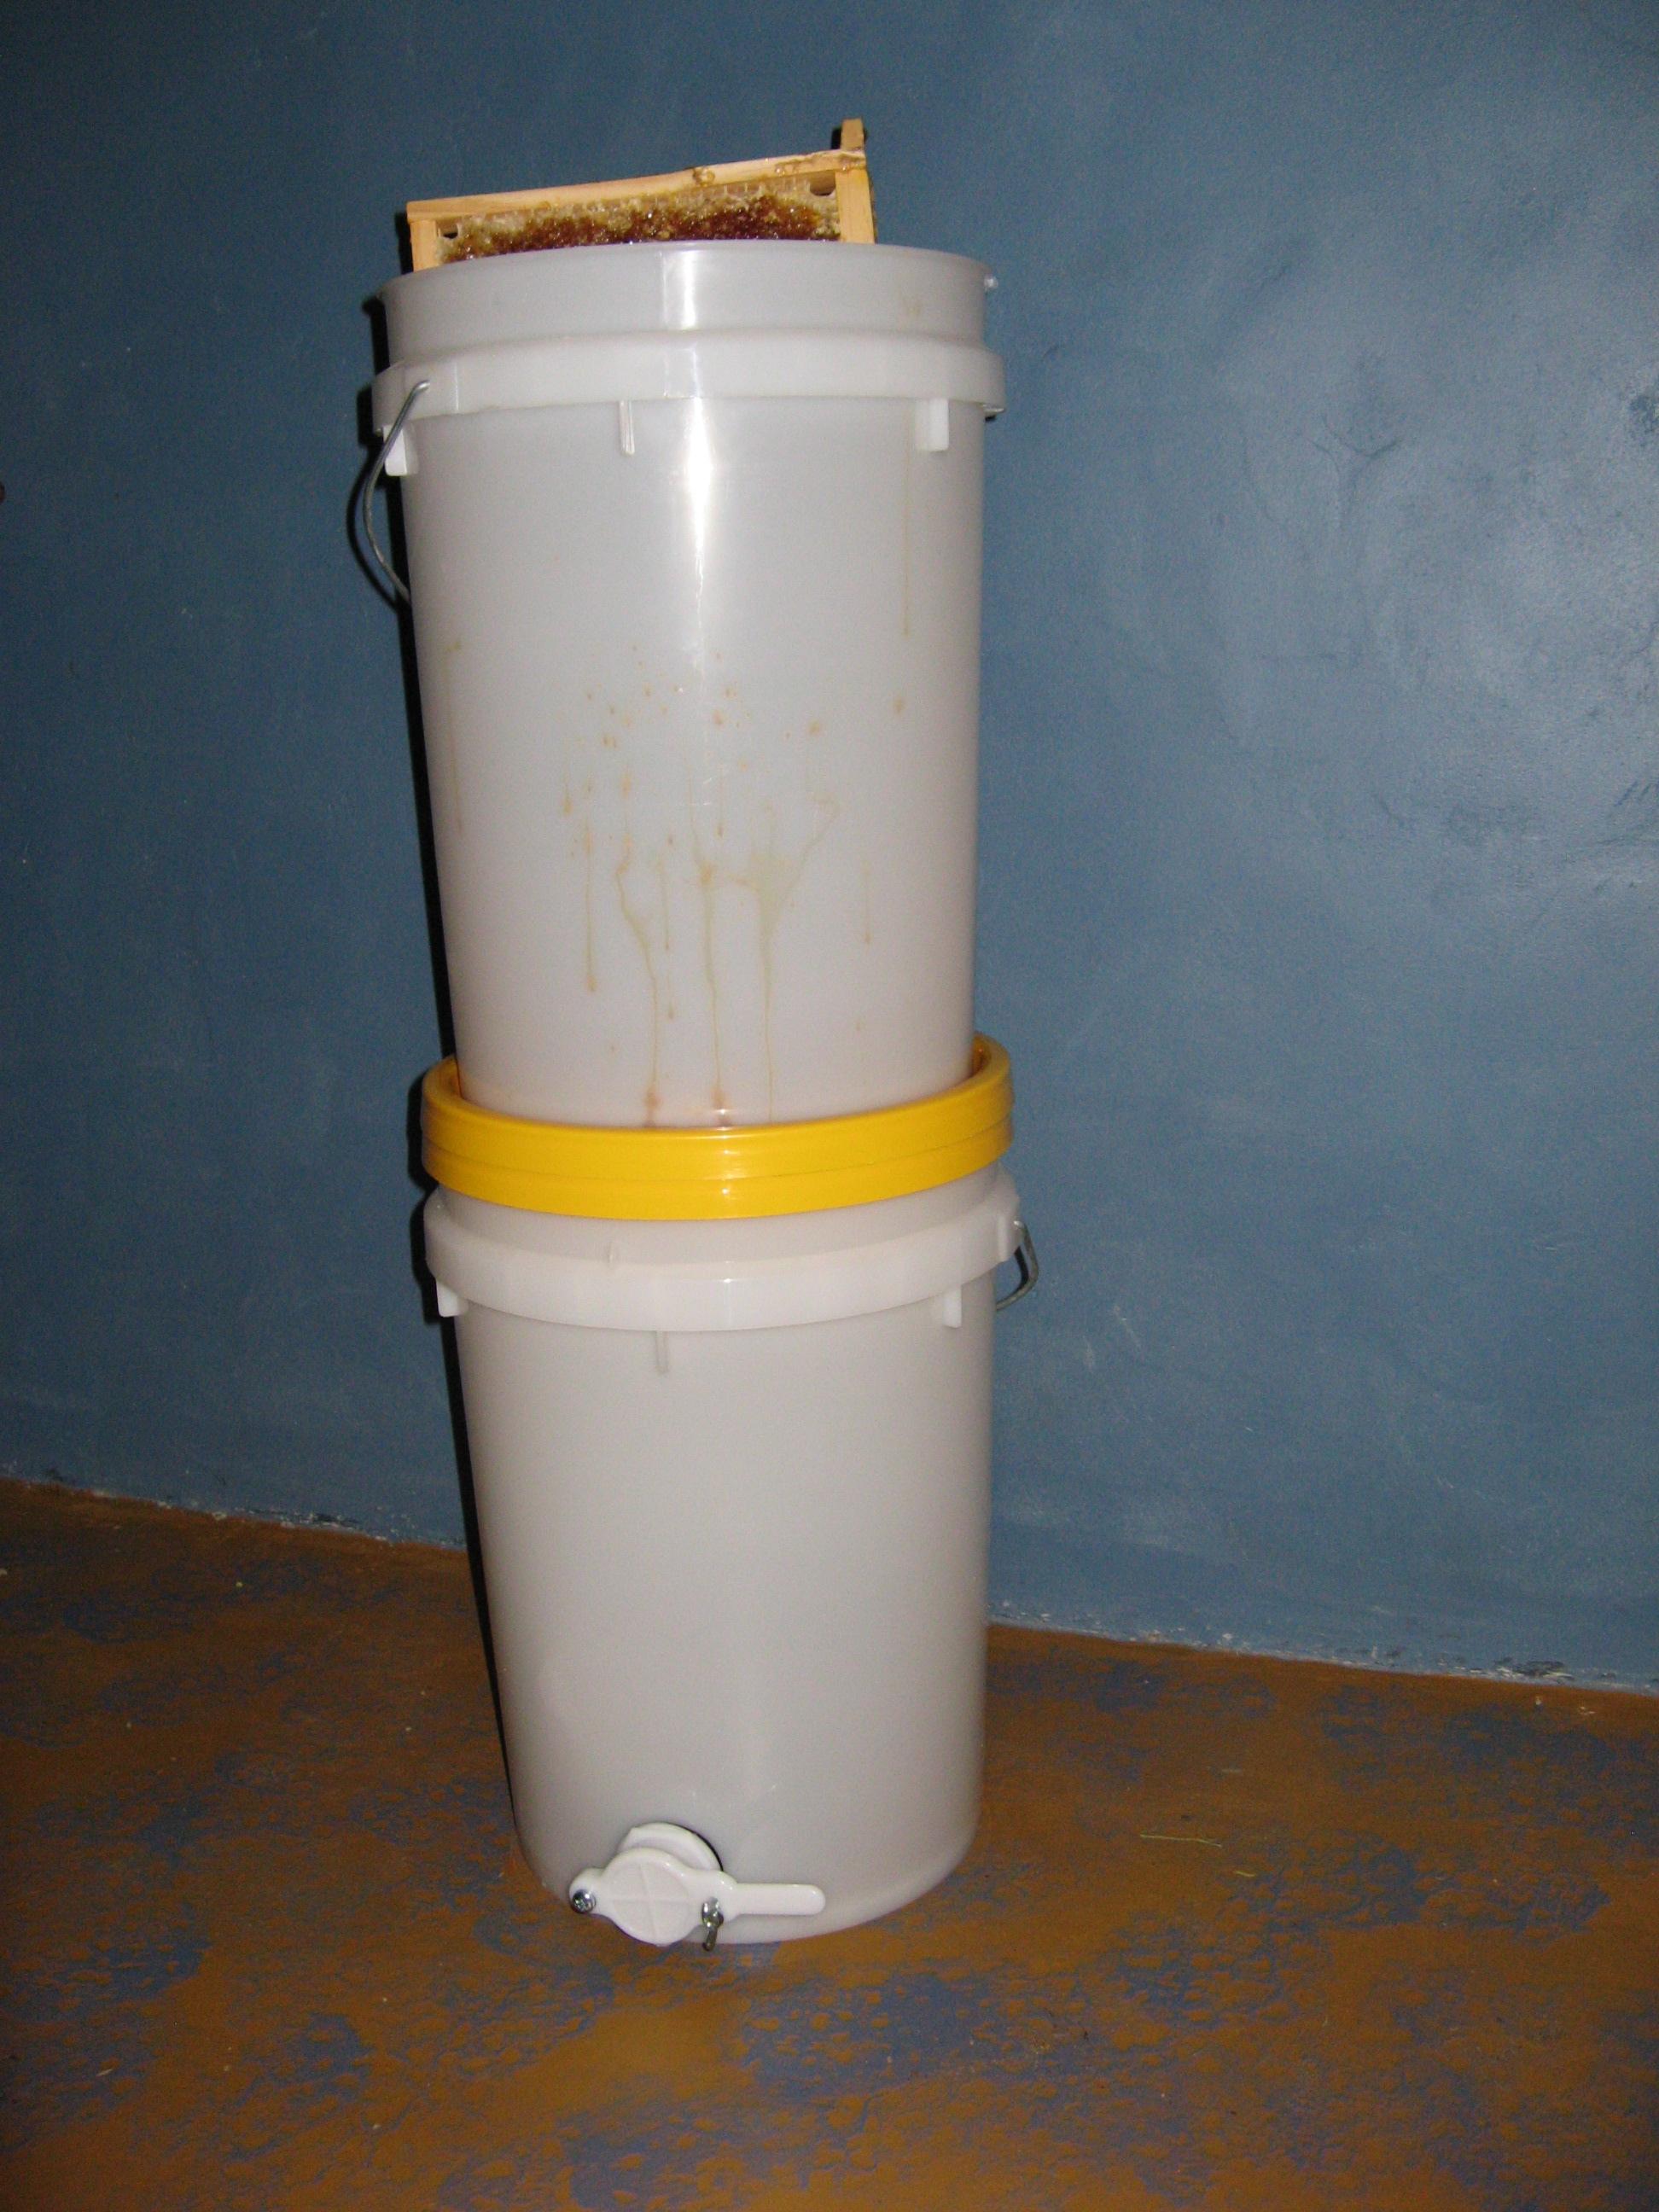 Honey drainage system